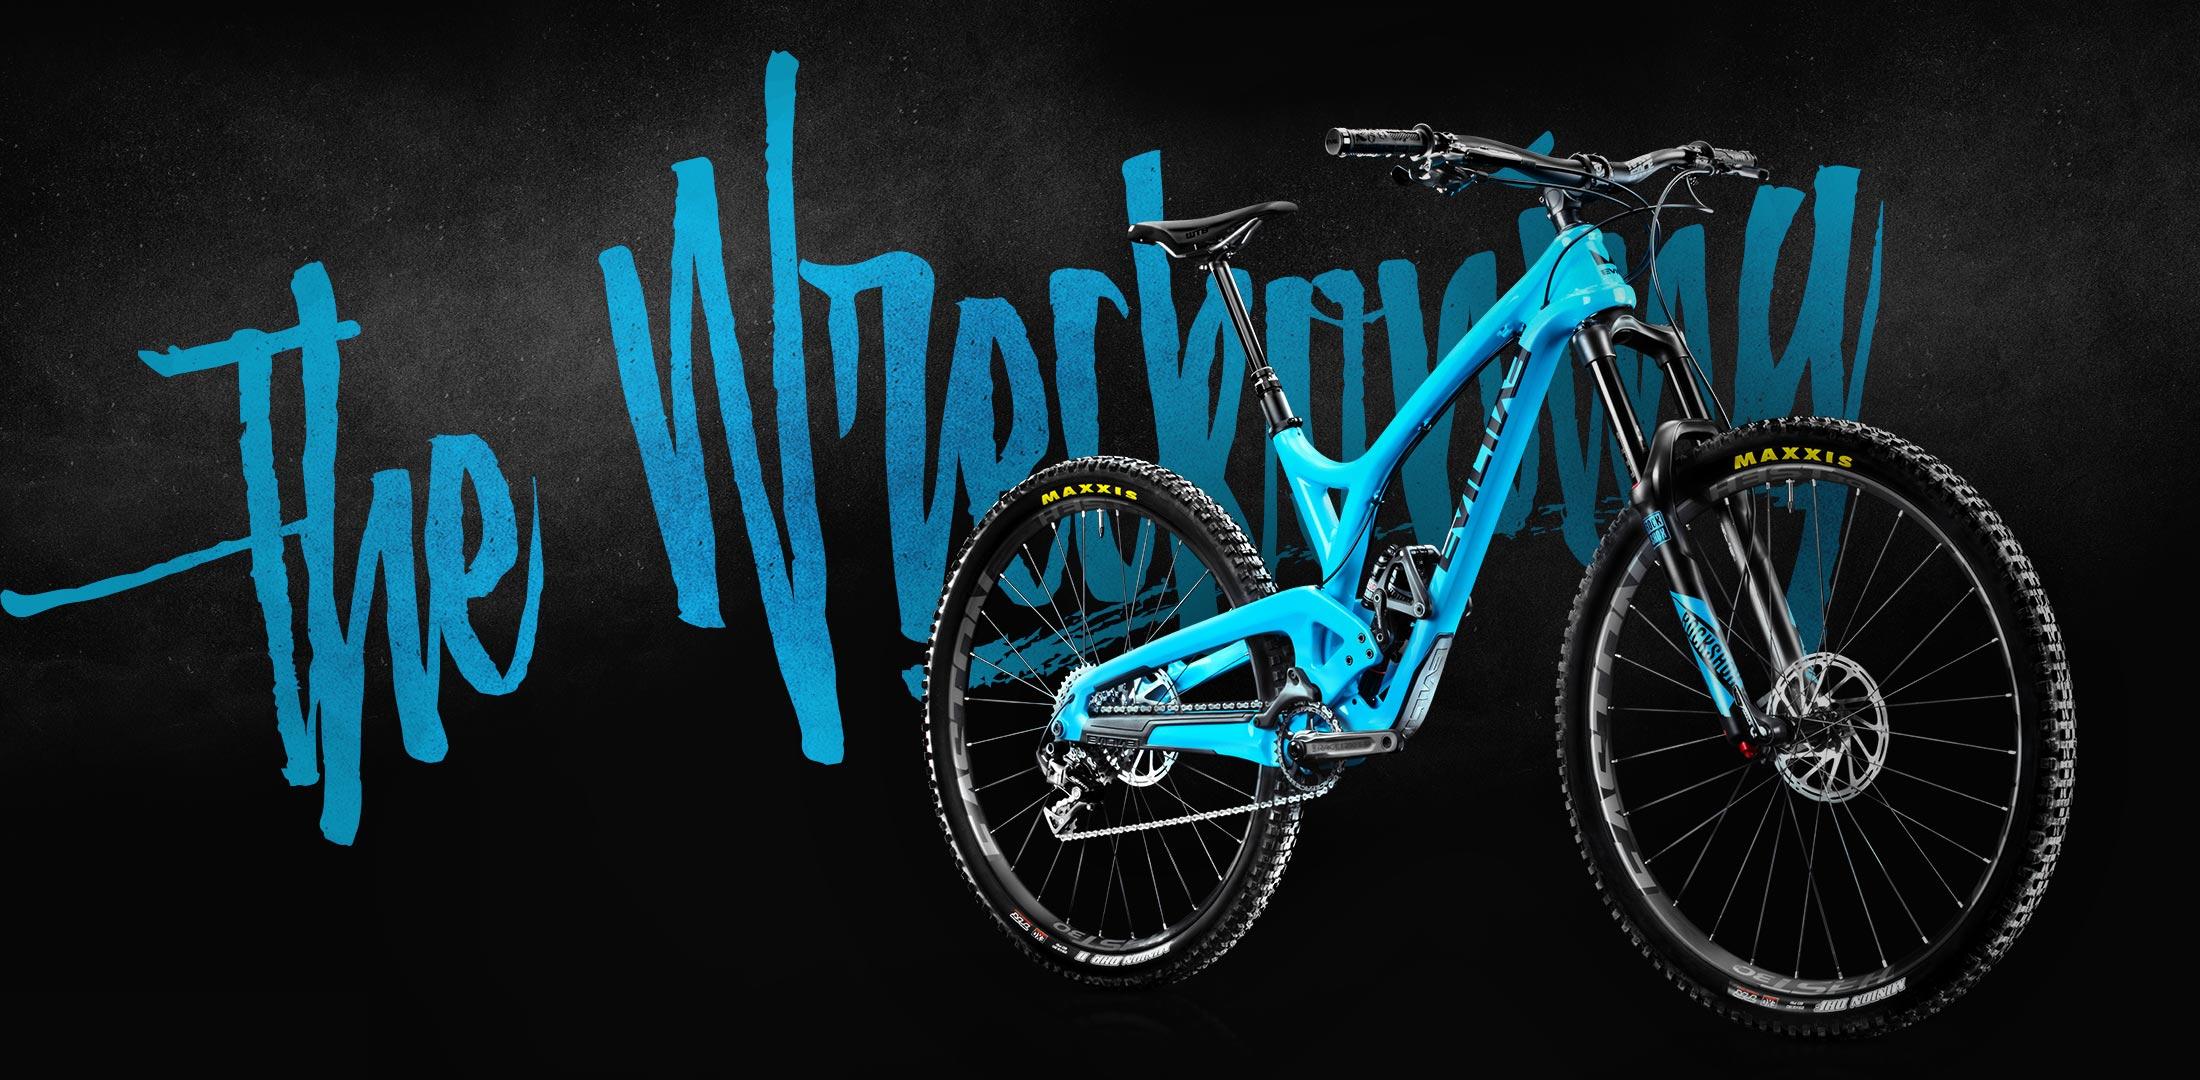 evil-wreckoning-bike-hero-2200x1080